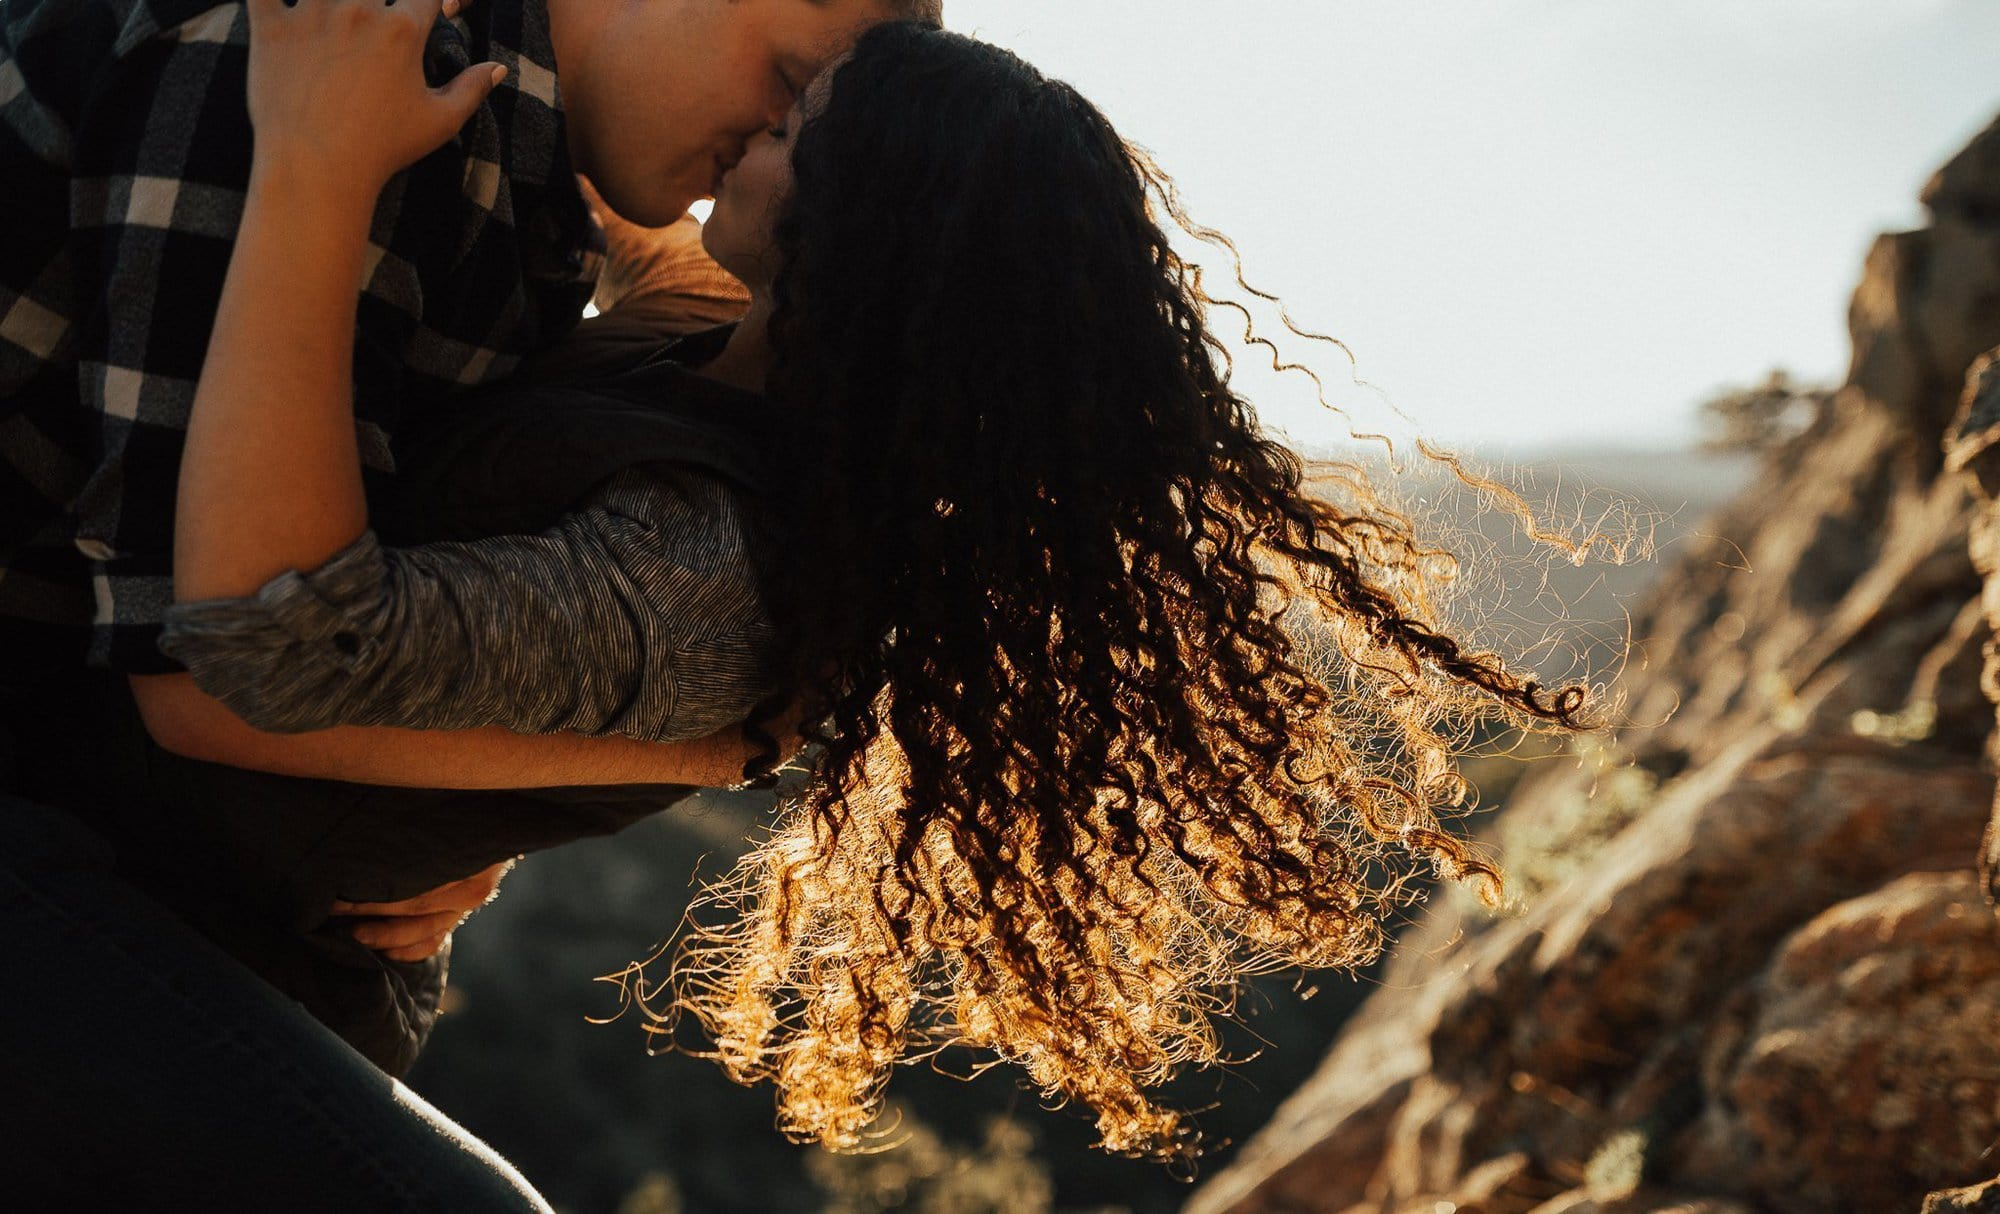 Boulder Engagement Photos | Boulder PHOTOGRAPHER | THE Lost Gulch Outlook ENGAGEMENT | OSMP ENGAGEMENT | COLORADO MOUNTAIN ENGAGEMENT PHOTOGRAPHER